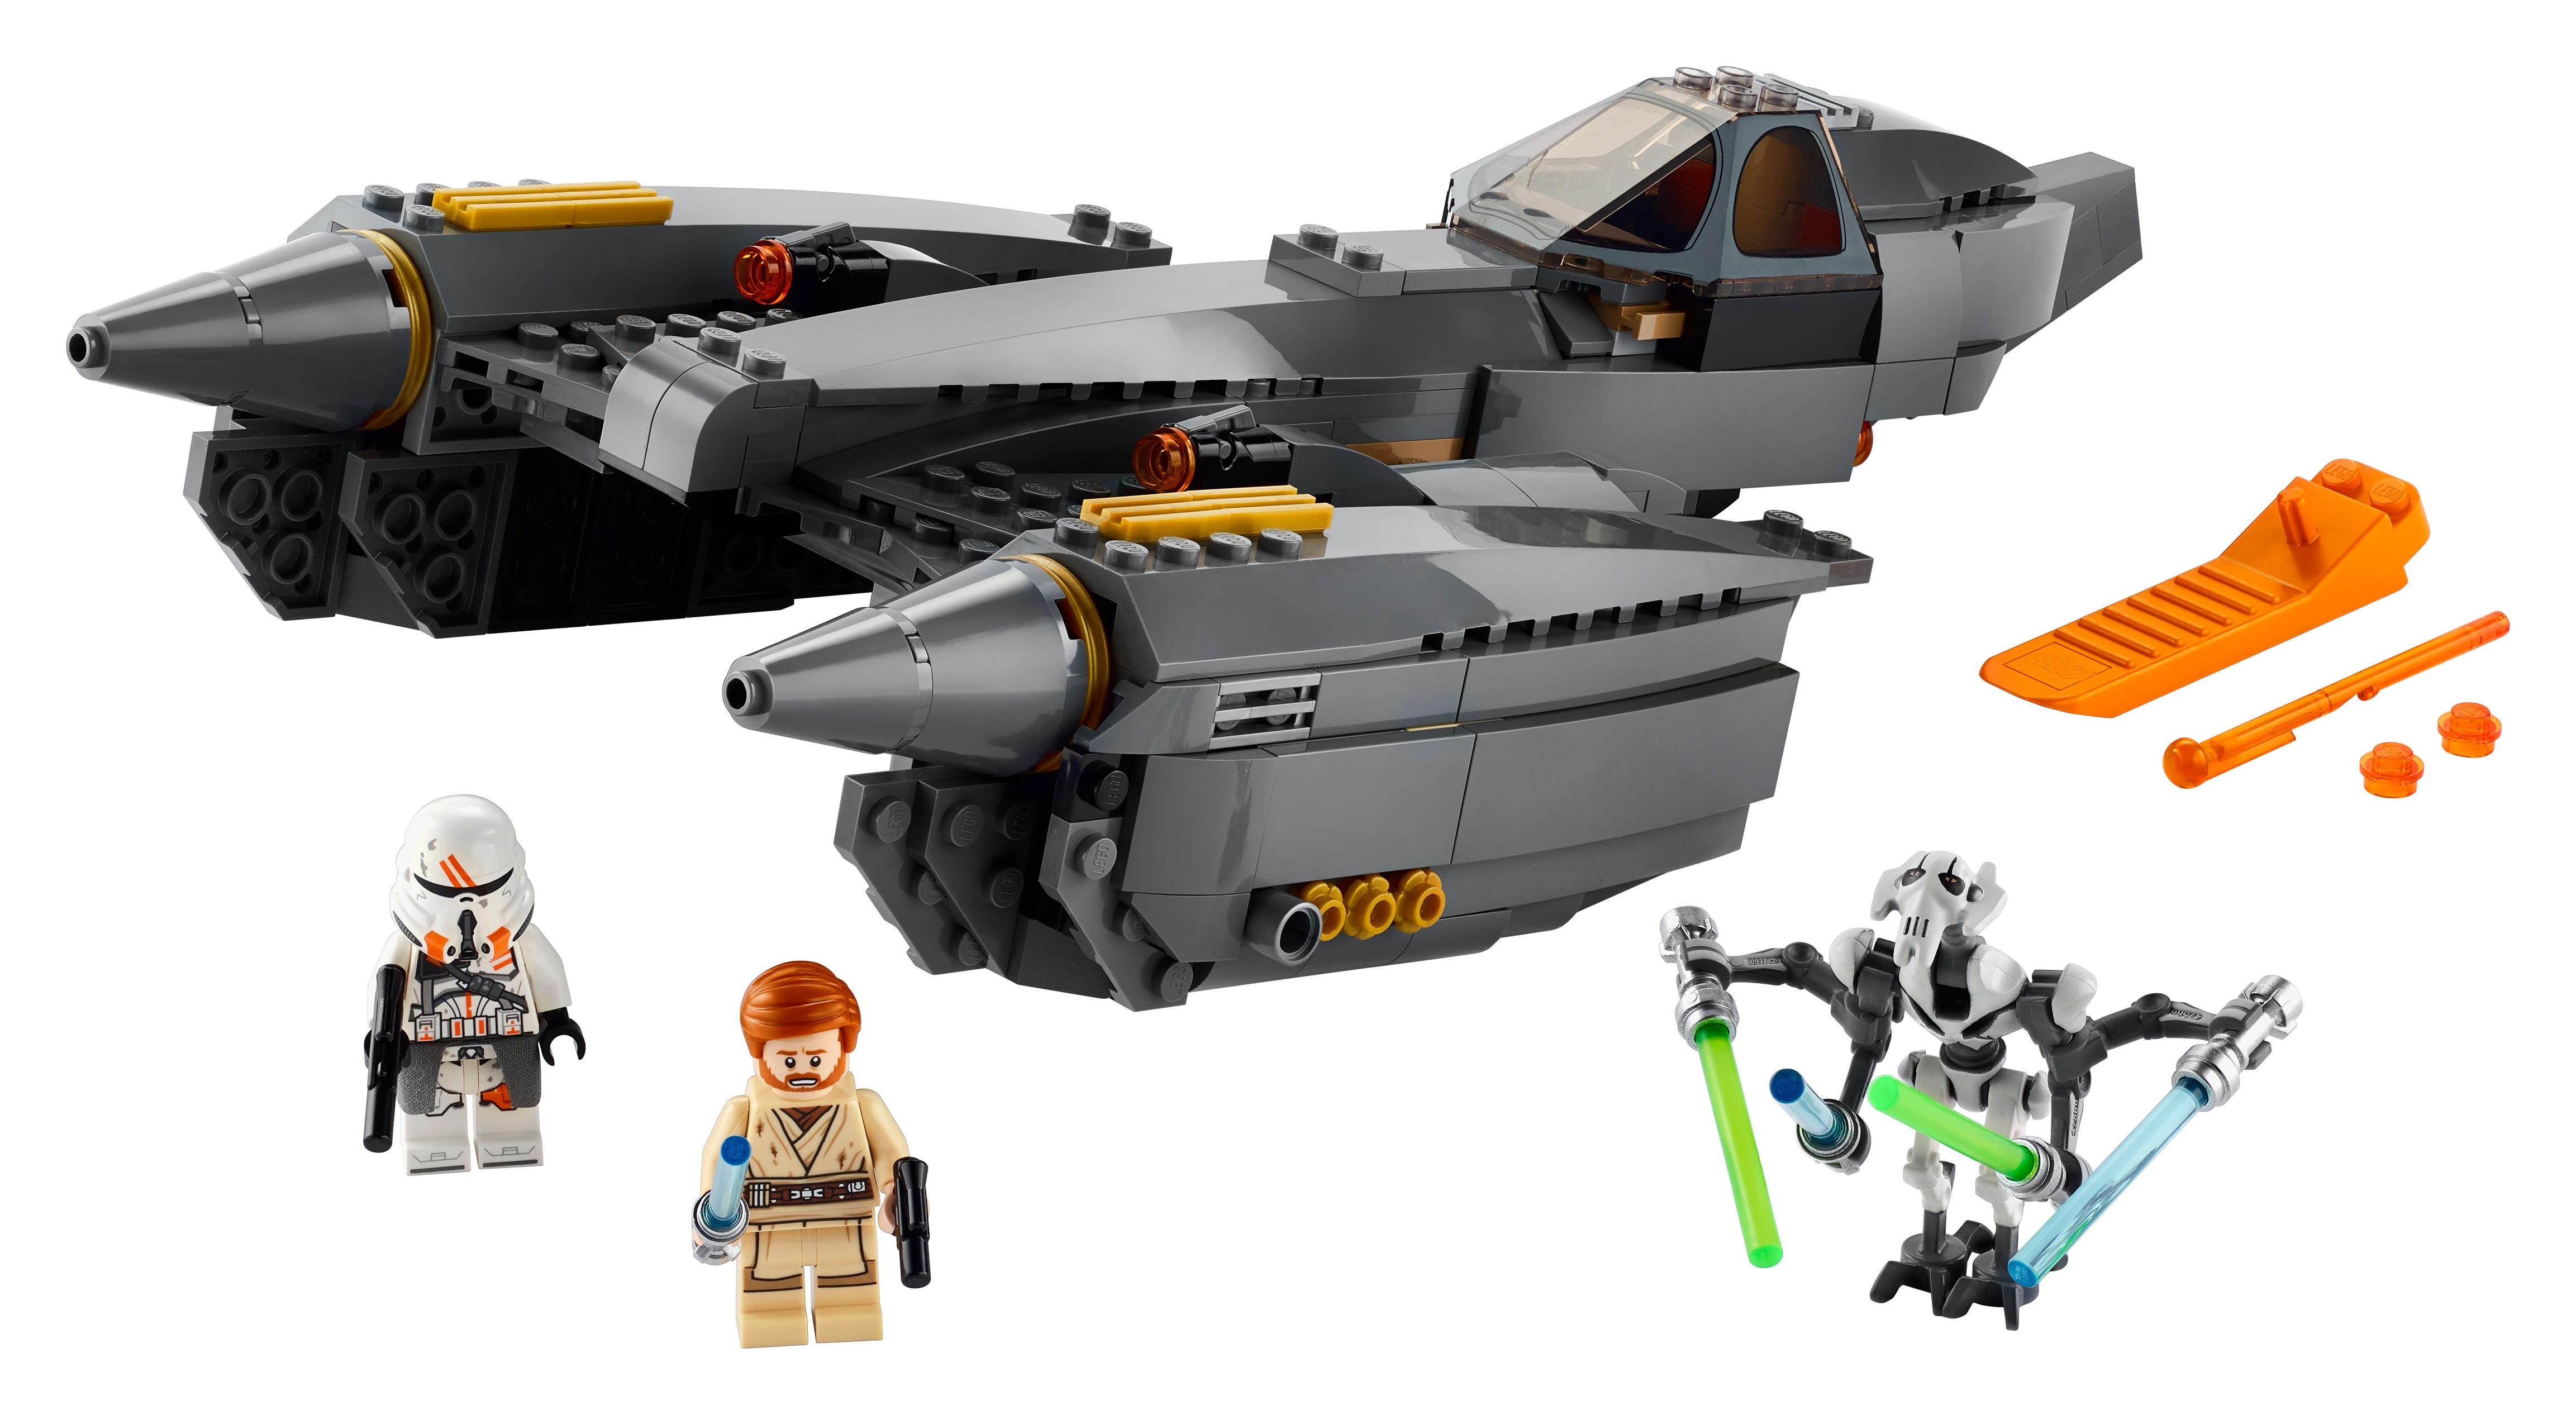 General Grievous Star Wars Clone Wars Minifigure US SELLER New